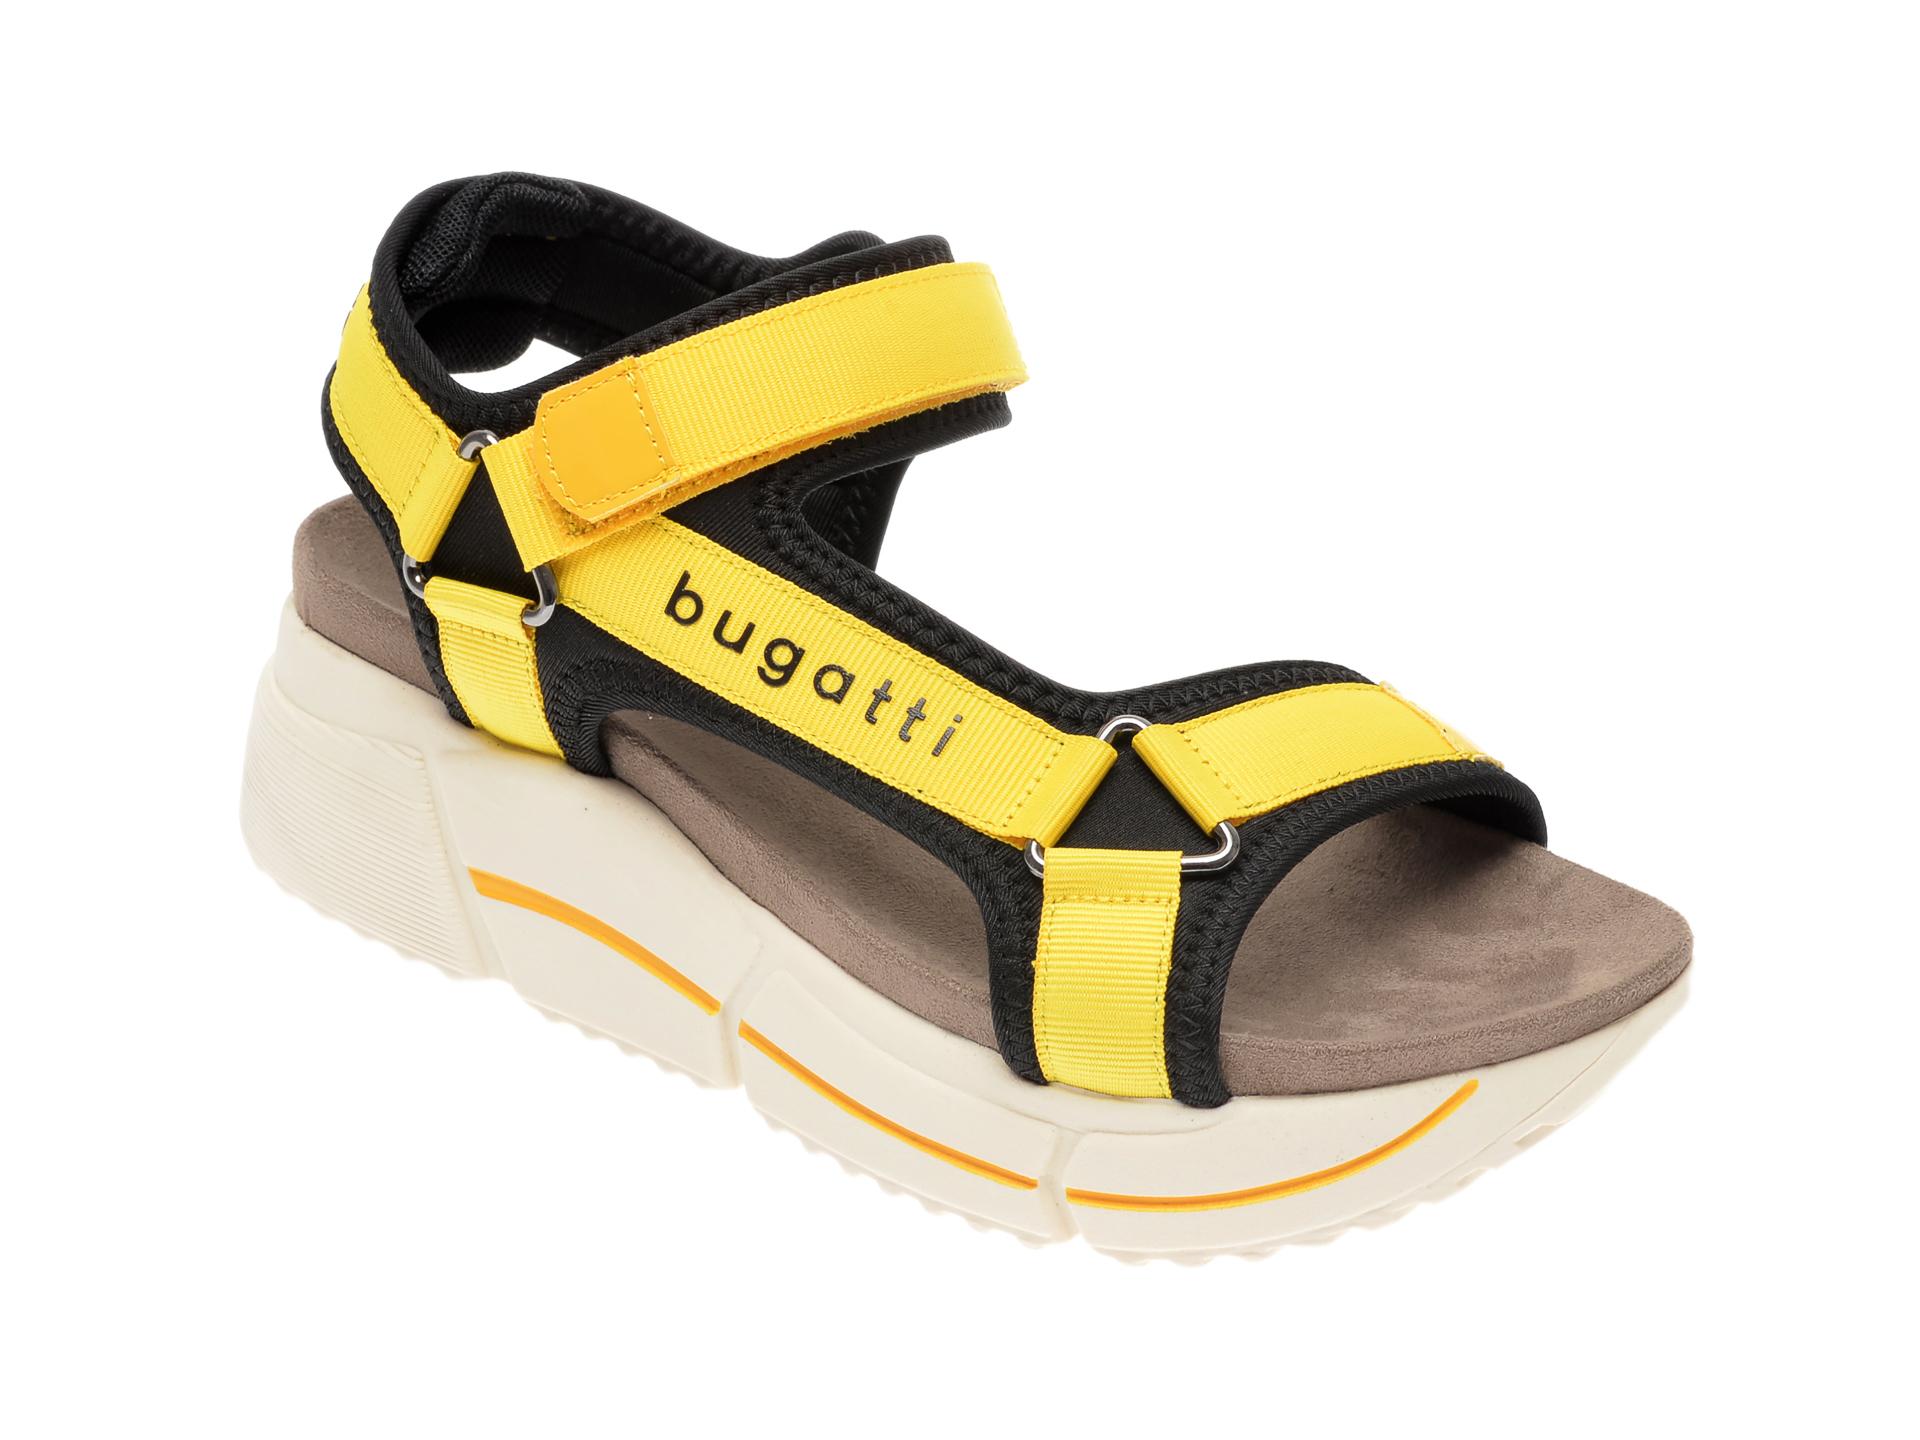 Sandale BUGATTI galbene, 88182, din piele ecologica